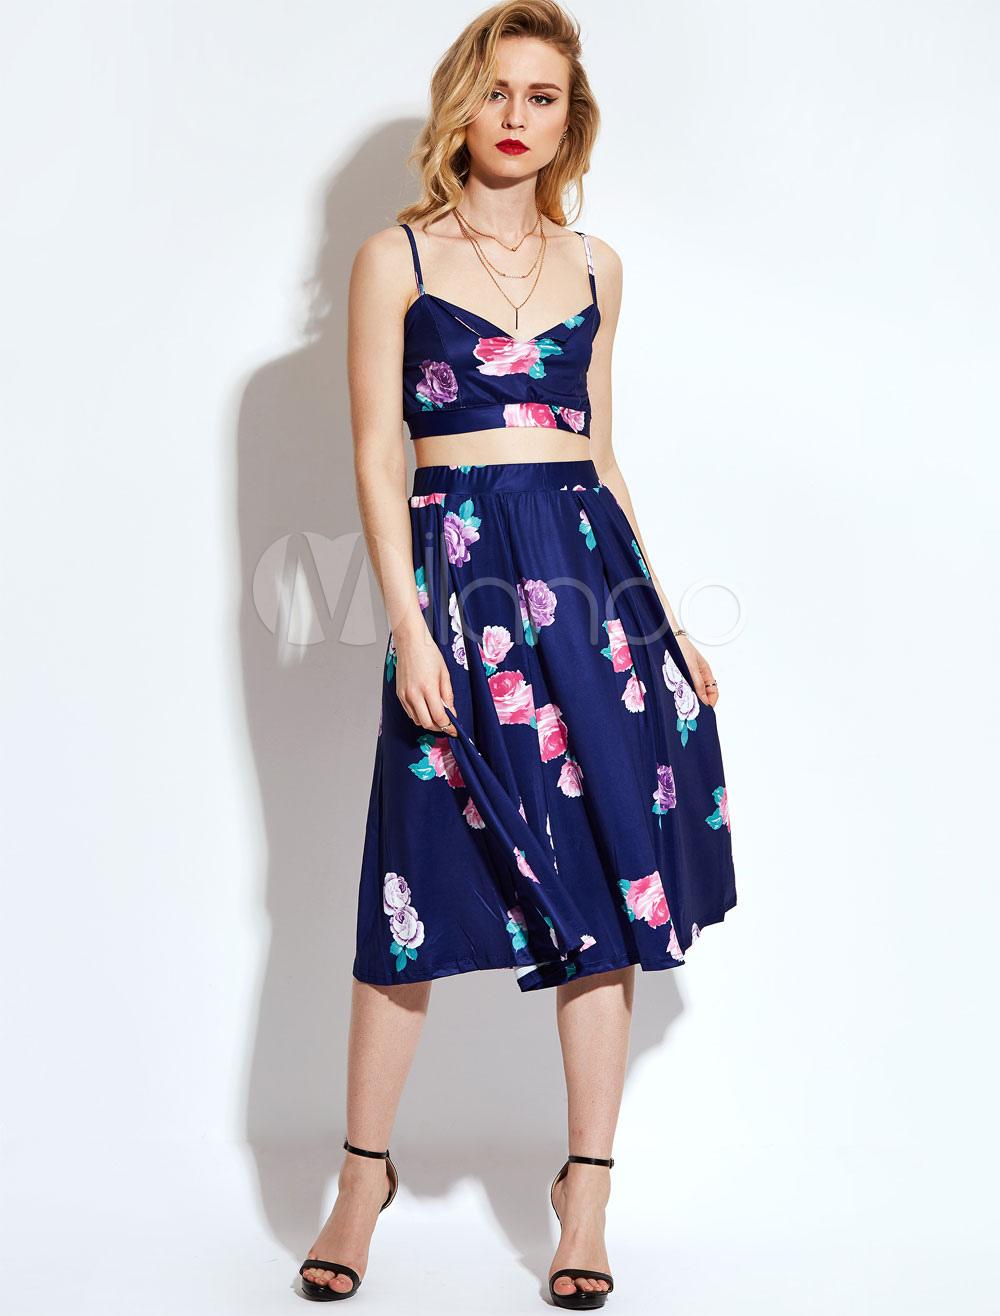 Women Skirts Set Boho Deep Blue Straps Sleeveless Floral Print Crop Top With Long Skirt thumbnail